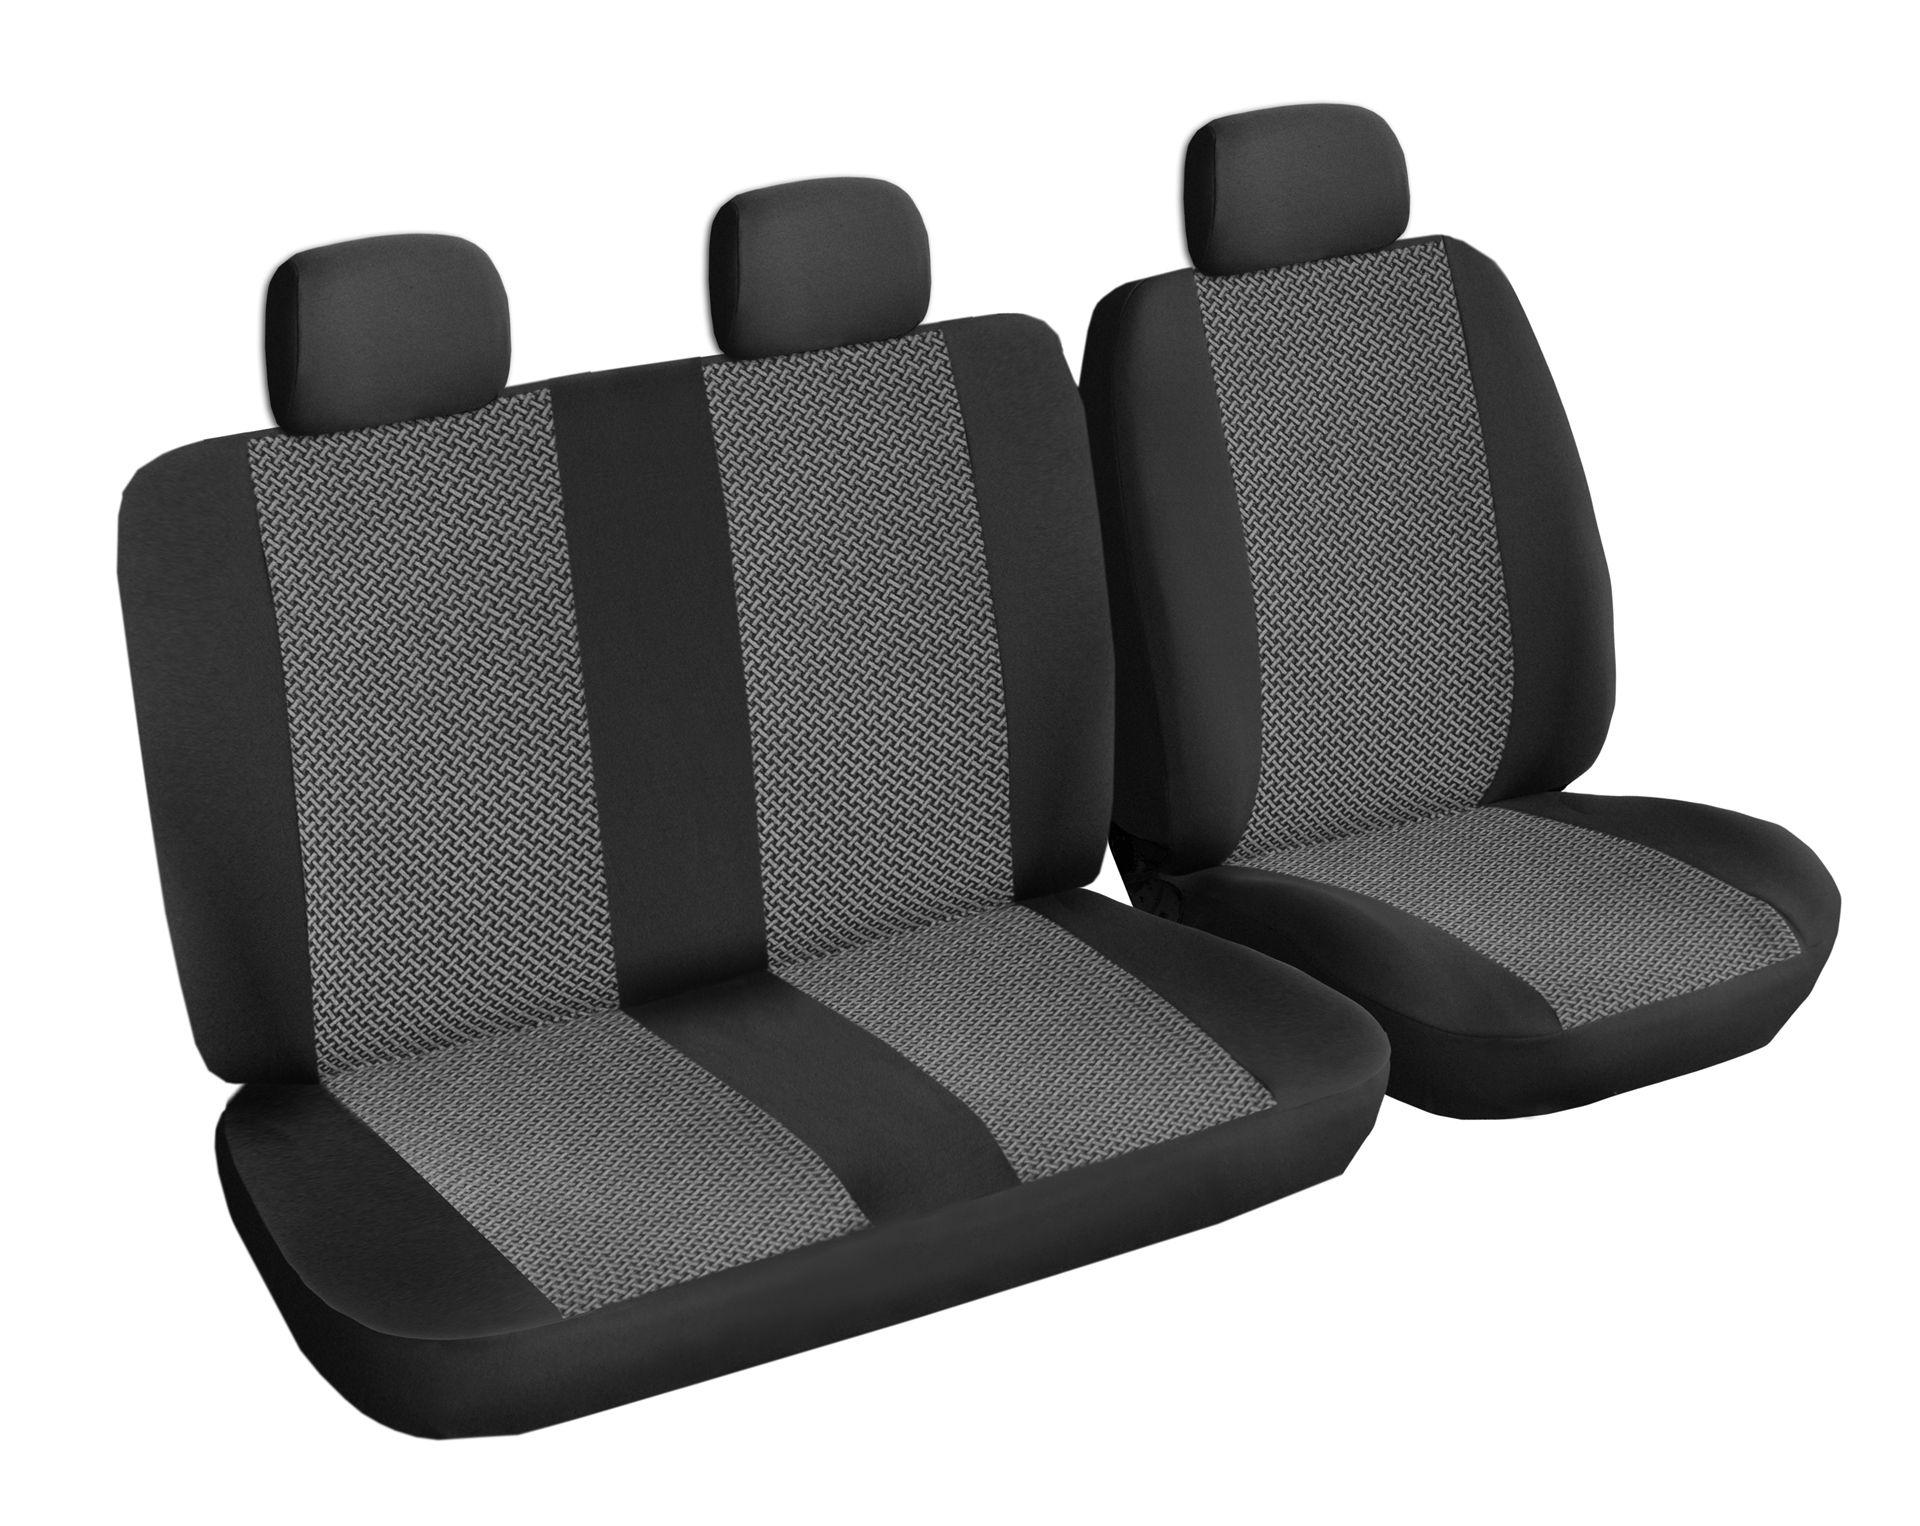 Autopotahy PEUGEOT EXPERT III, Citroën Jumpy III 3 místa, od r. 2016, šedo černé SIXTOL